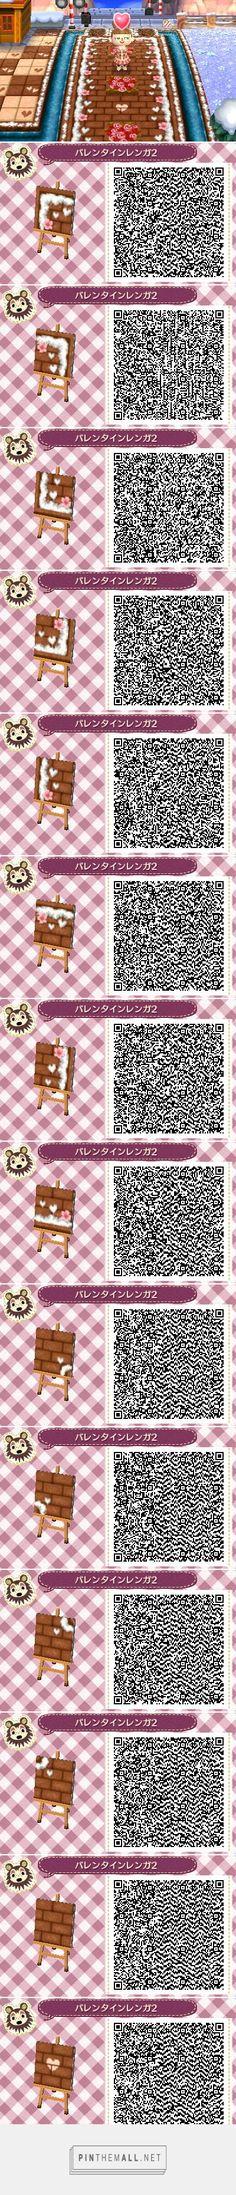 Sakura and snow border brown bricks with hearts accents